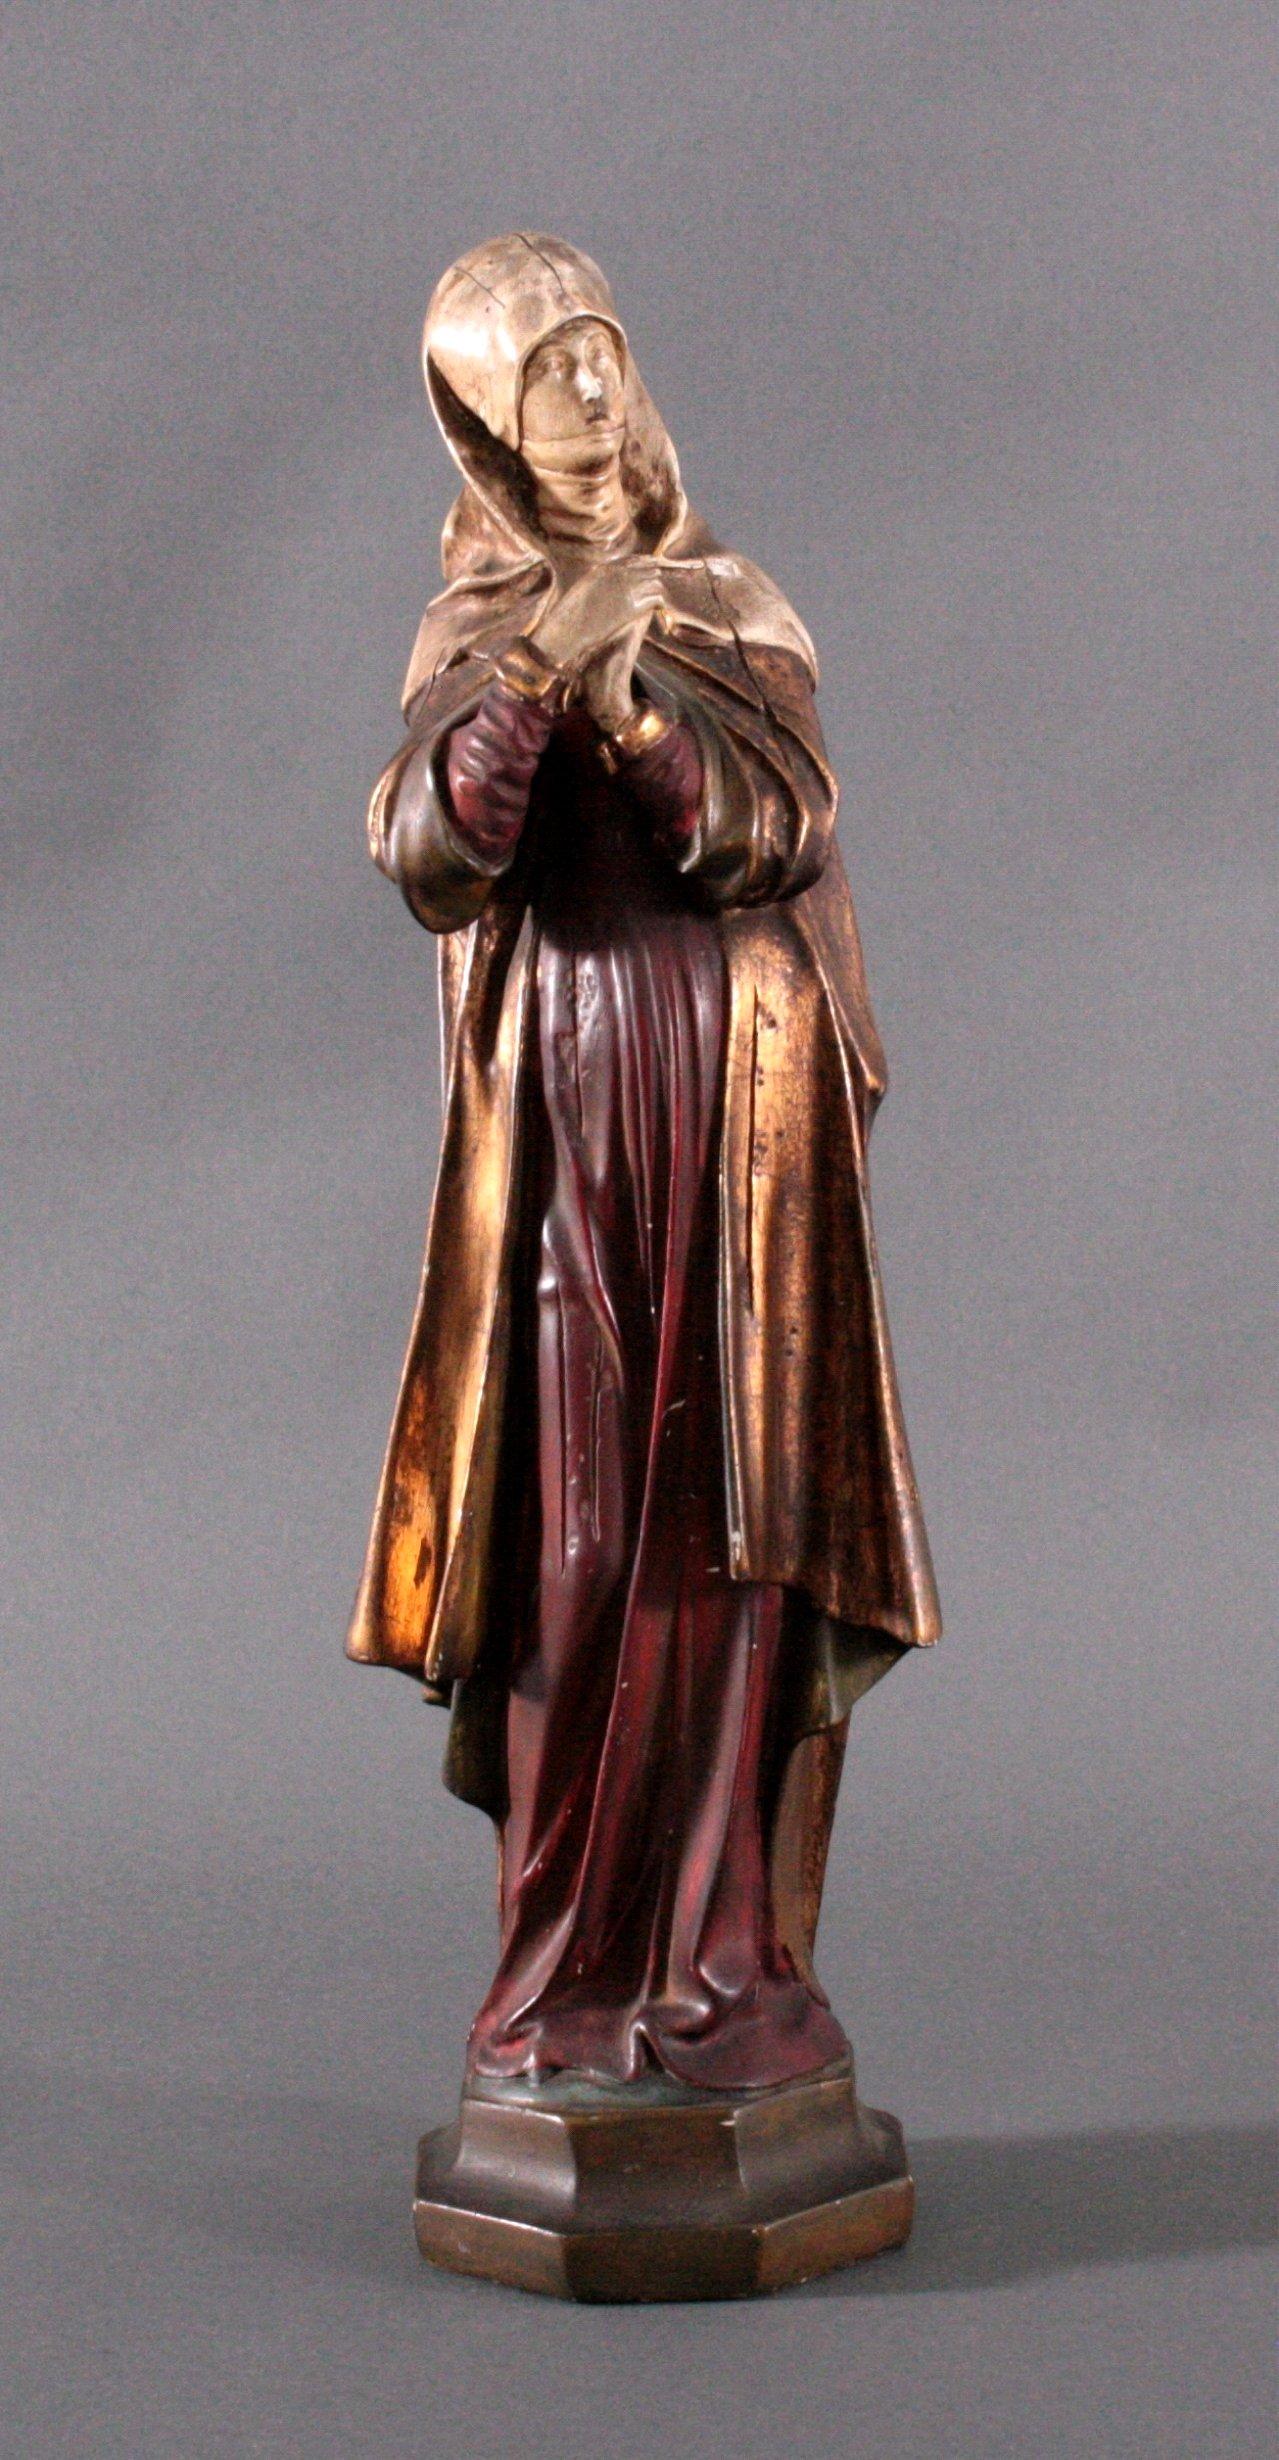 Betende Heilige Anna, Schwanger, 20. Jh.